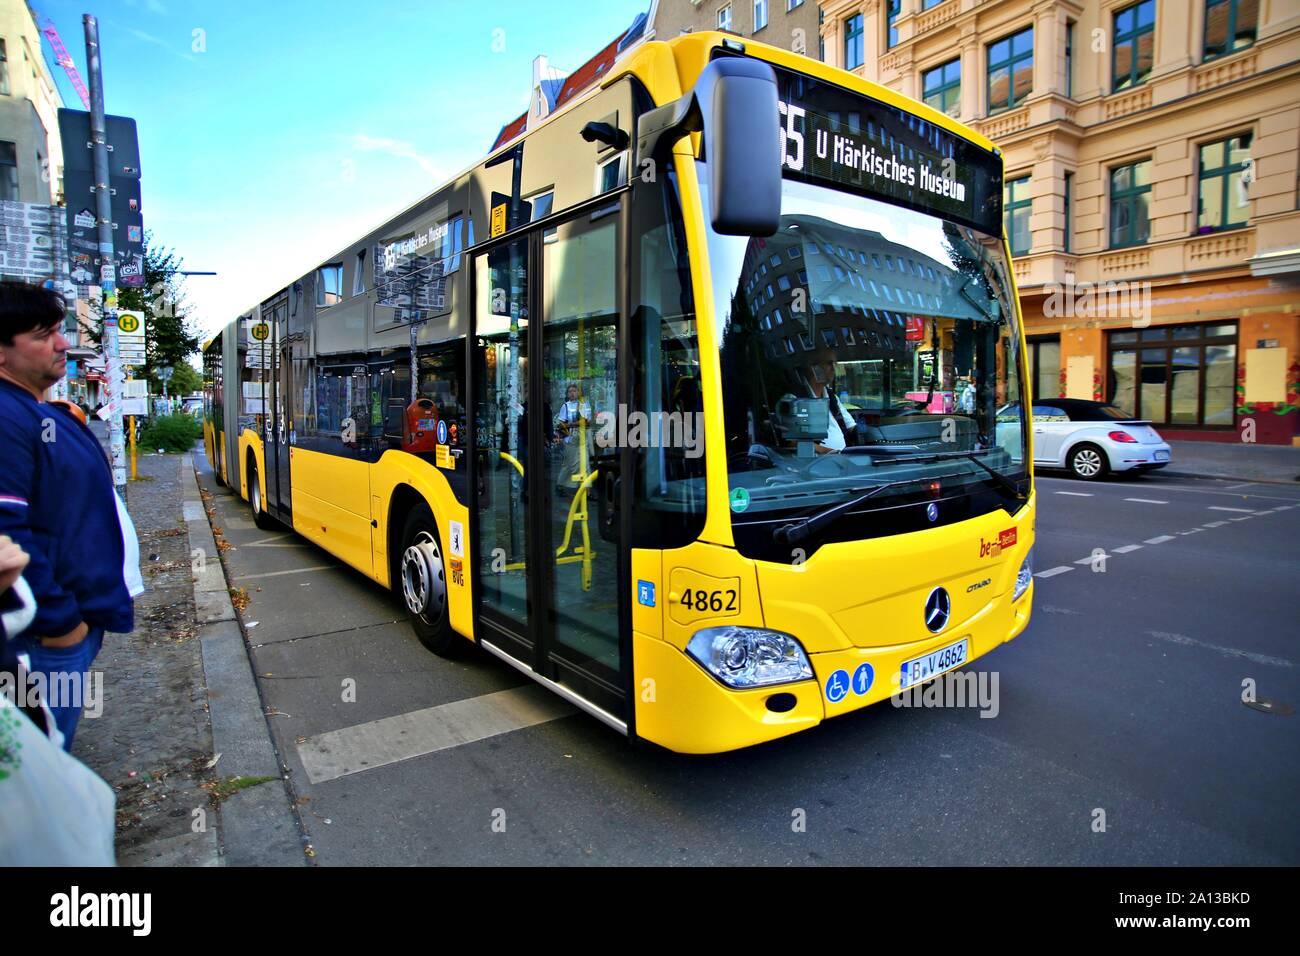 Berlin Germany Monday September 23 2019 Public Transportation City Bus In City Of Berlin Stock Photo Alamy